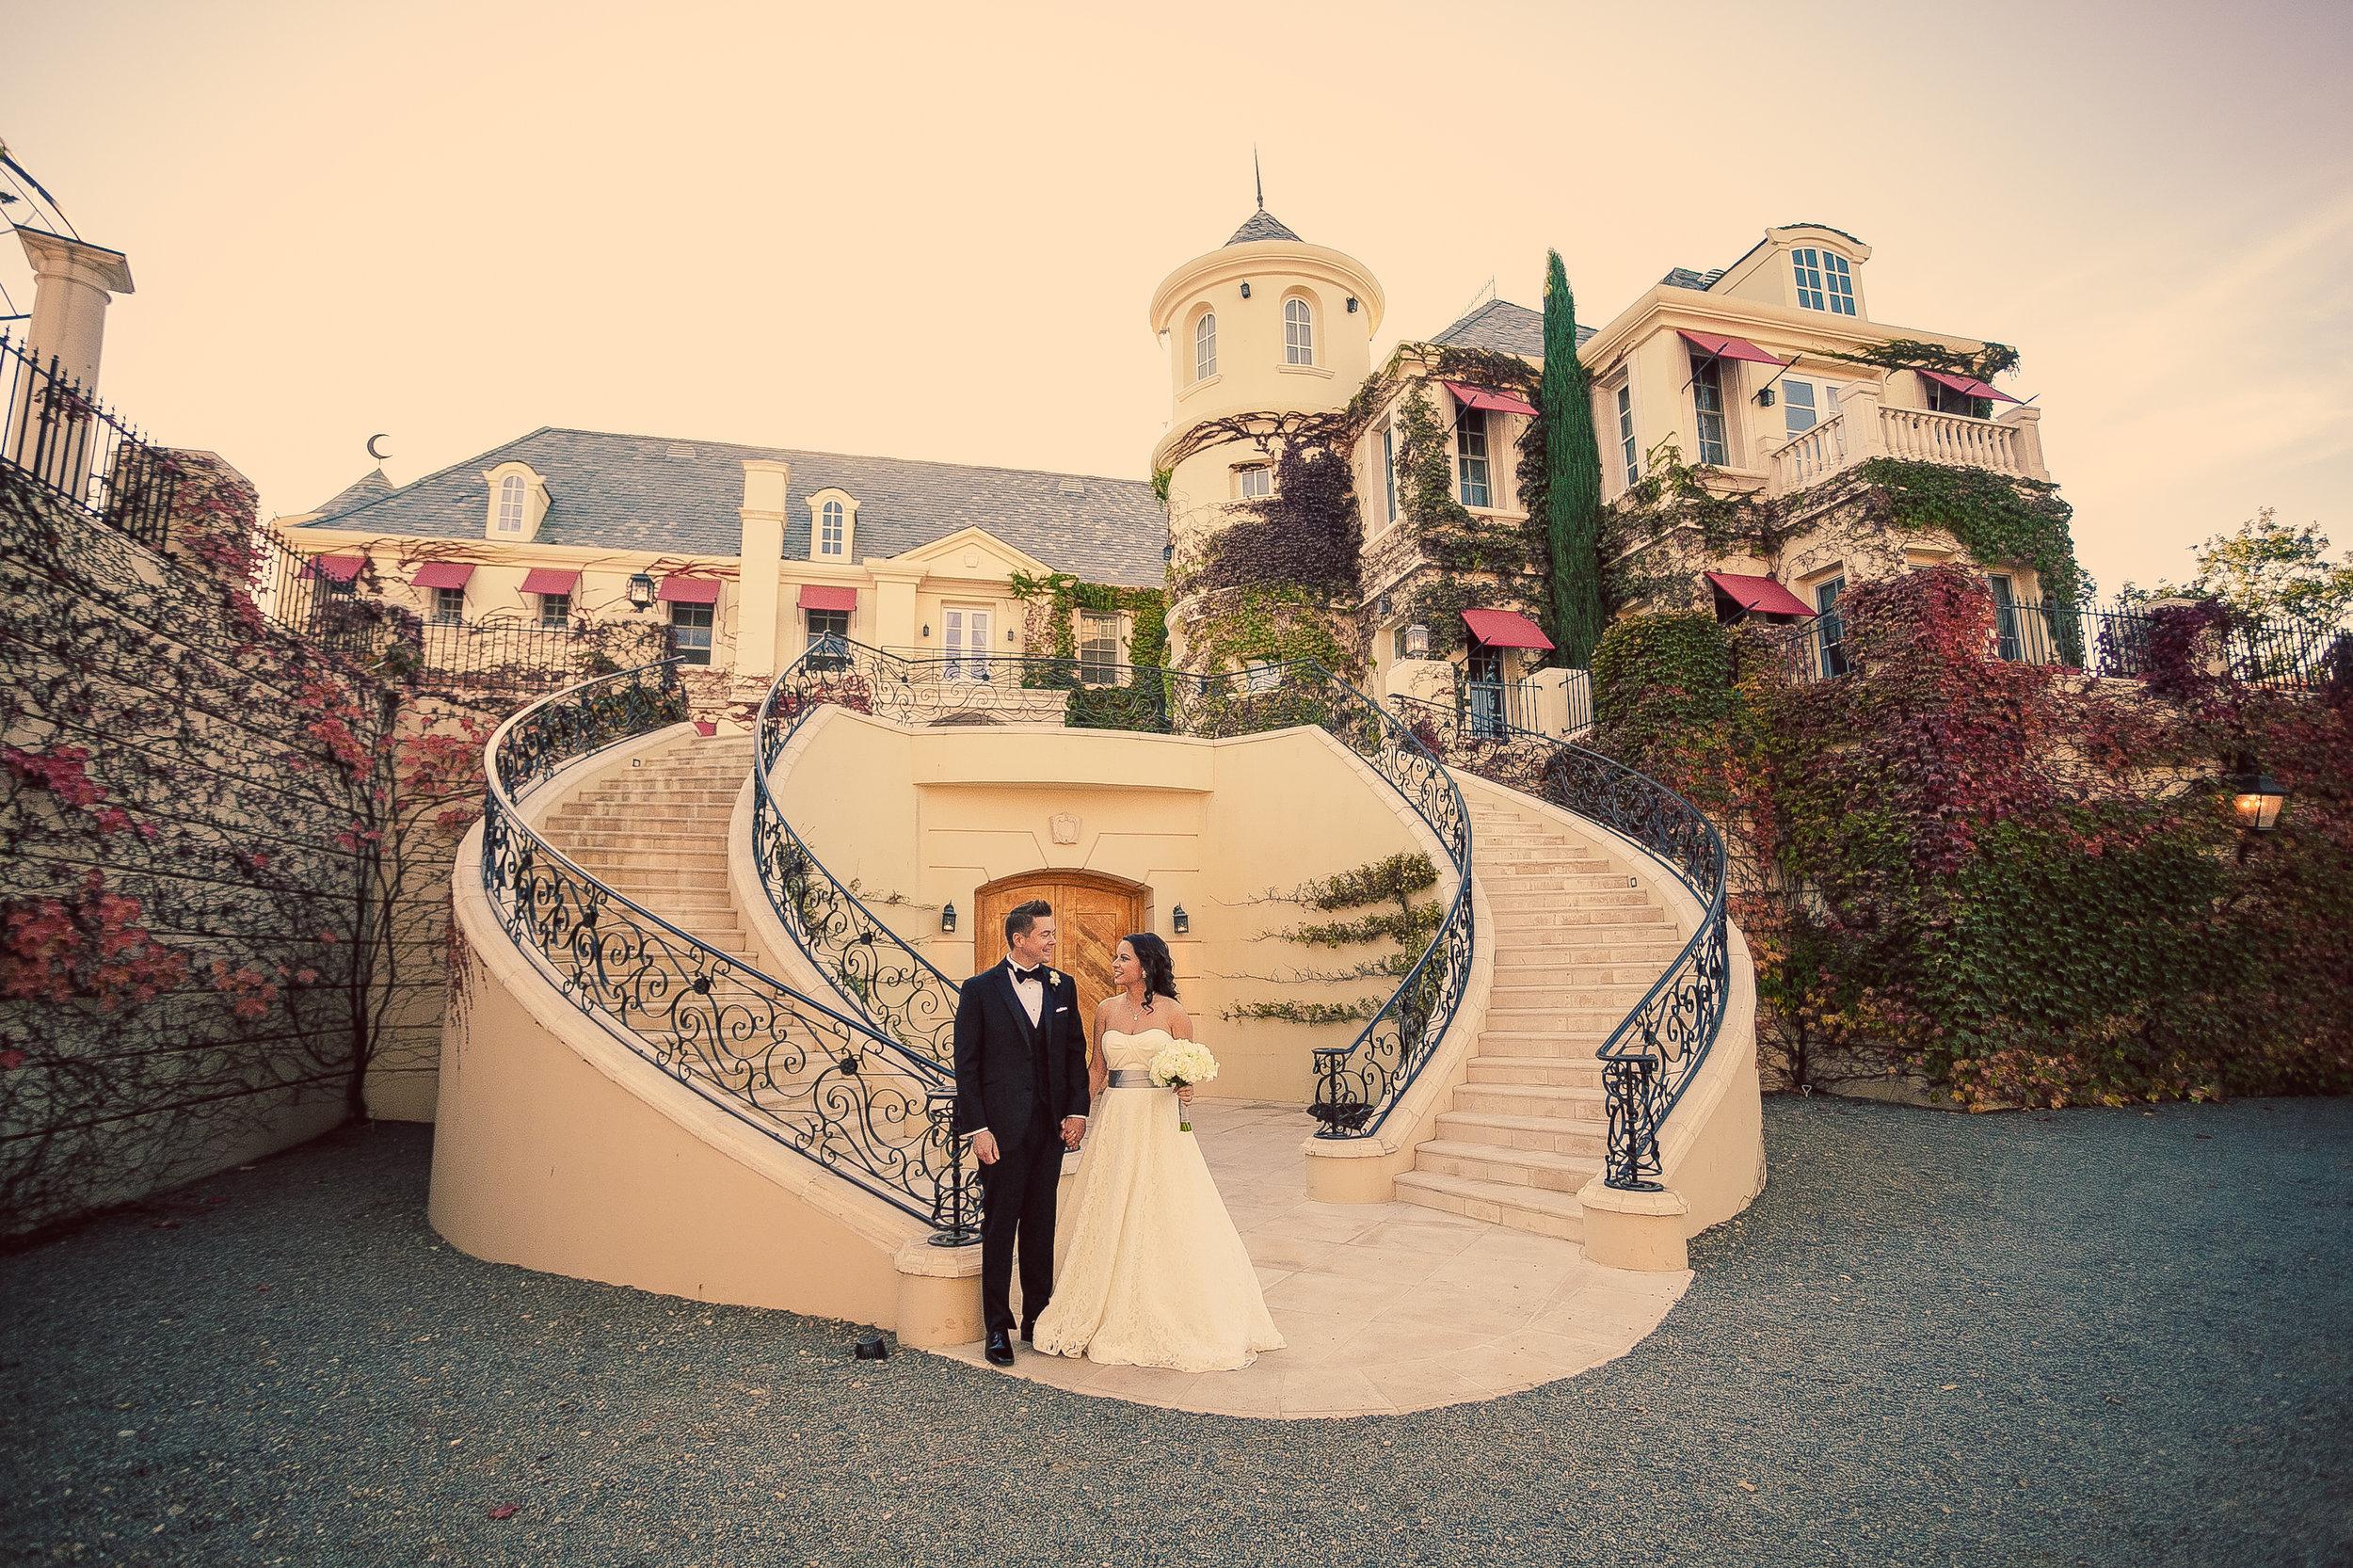 Justin Winery, Paso Robles, CA